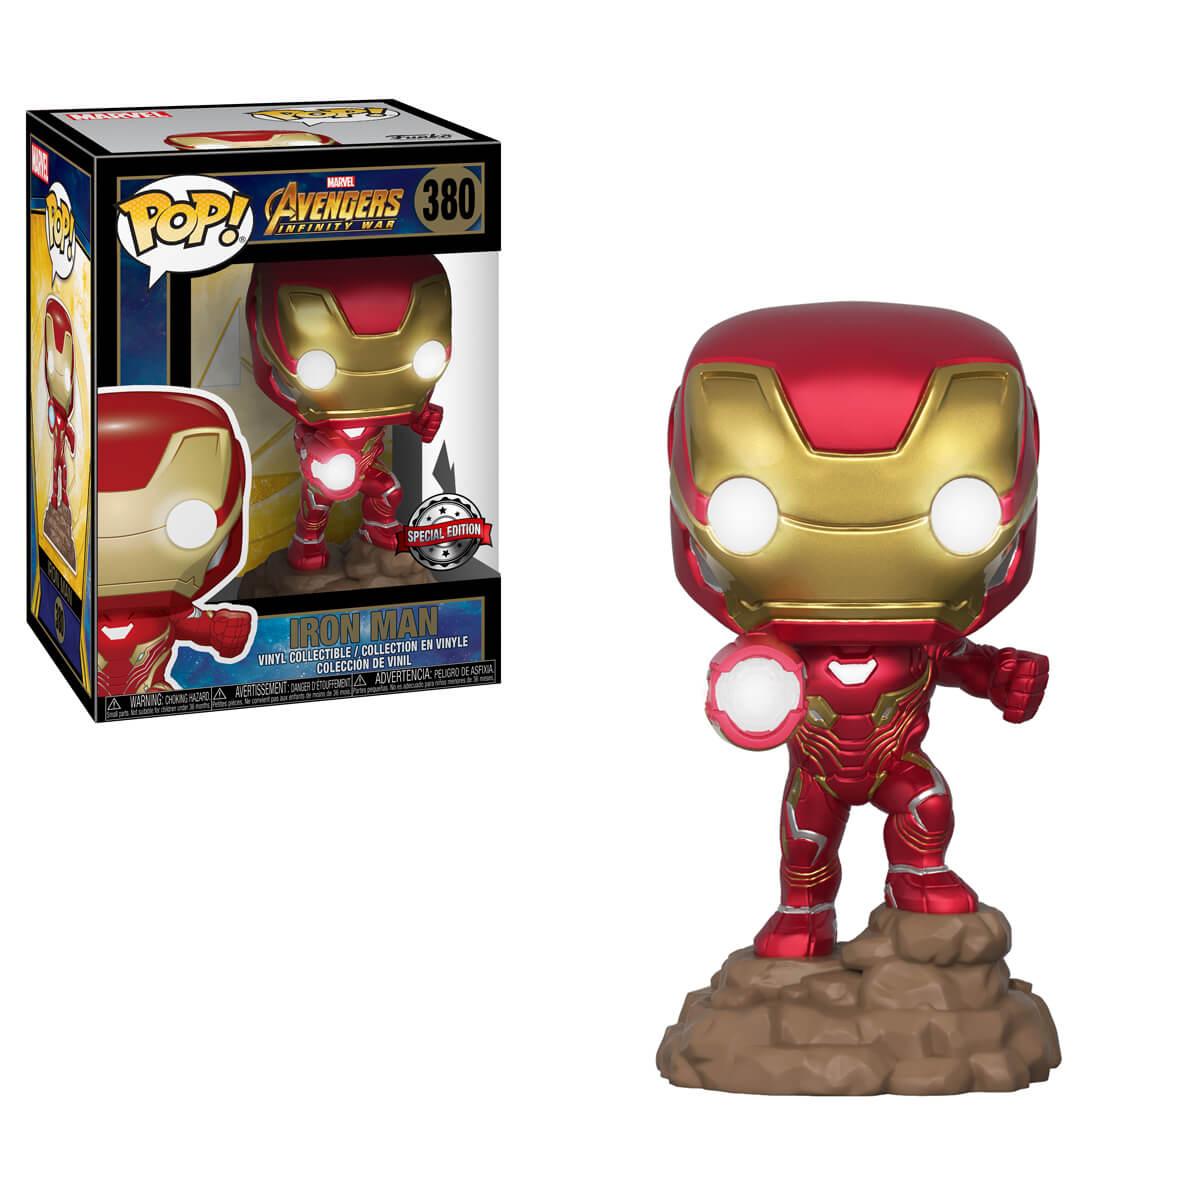 Funko POP! Iron Man (light up) Exclusive